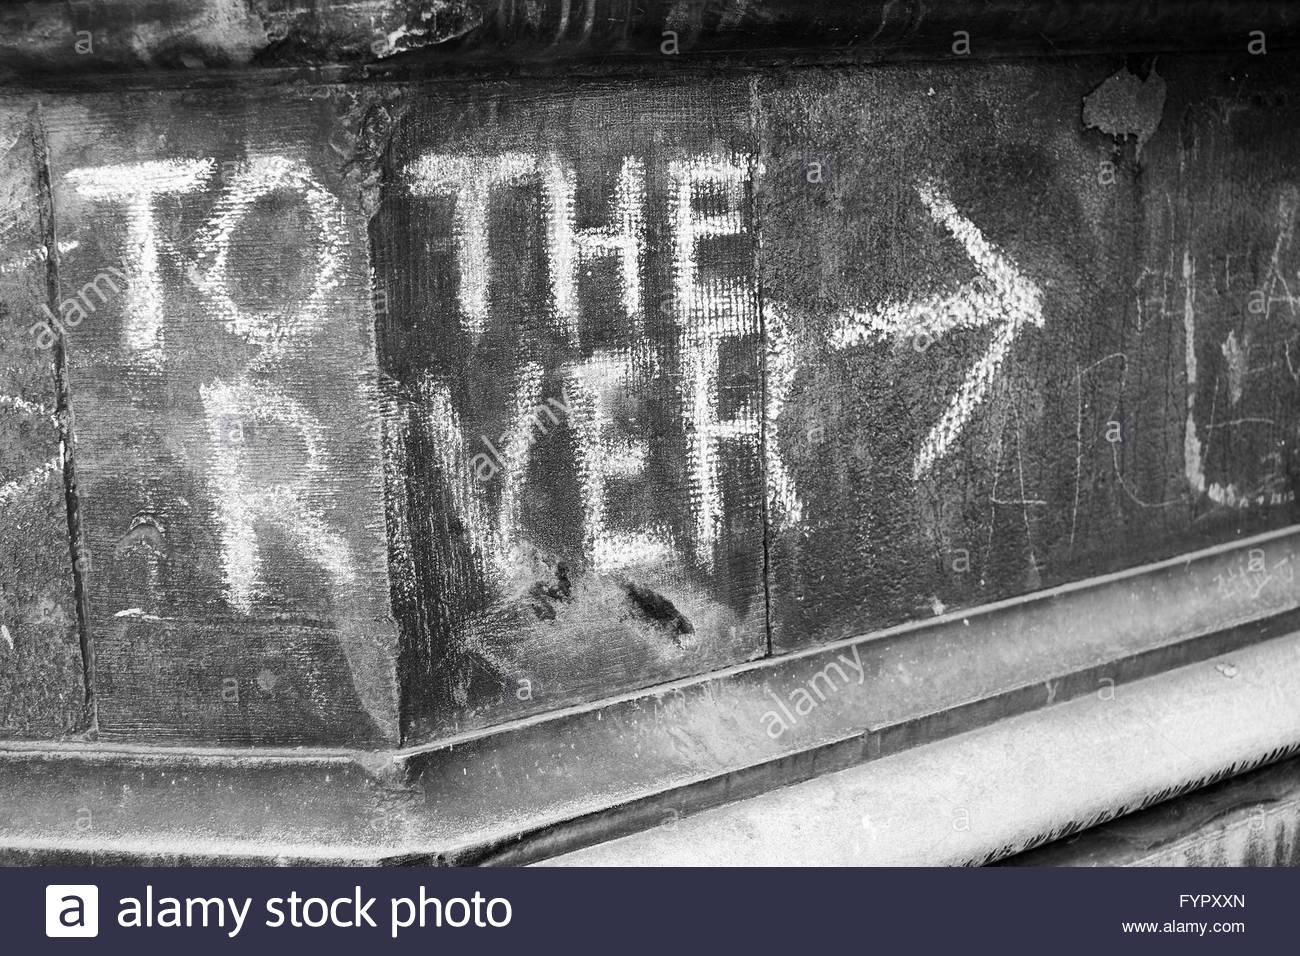 Graffiti wall cambridge - Graffiti On The Walls Of An Historical Cambridge City Building Directing Tourists To The River Cam Cambridge United Kingdom